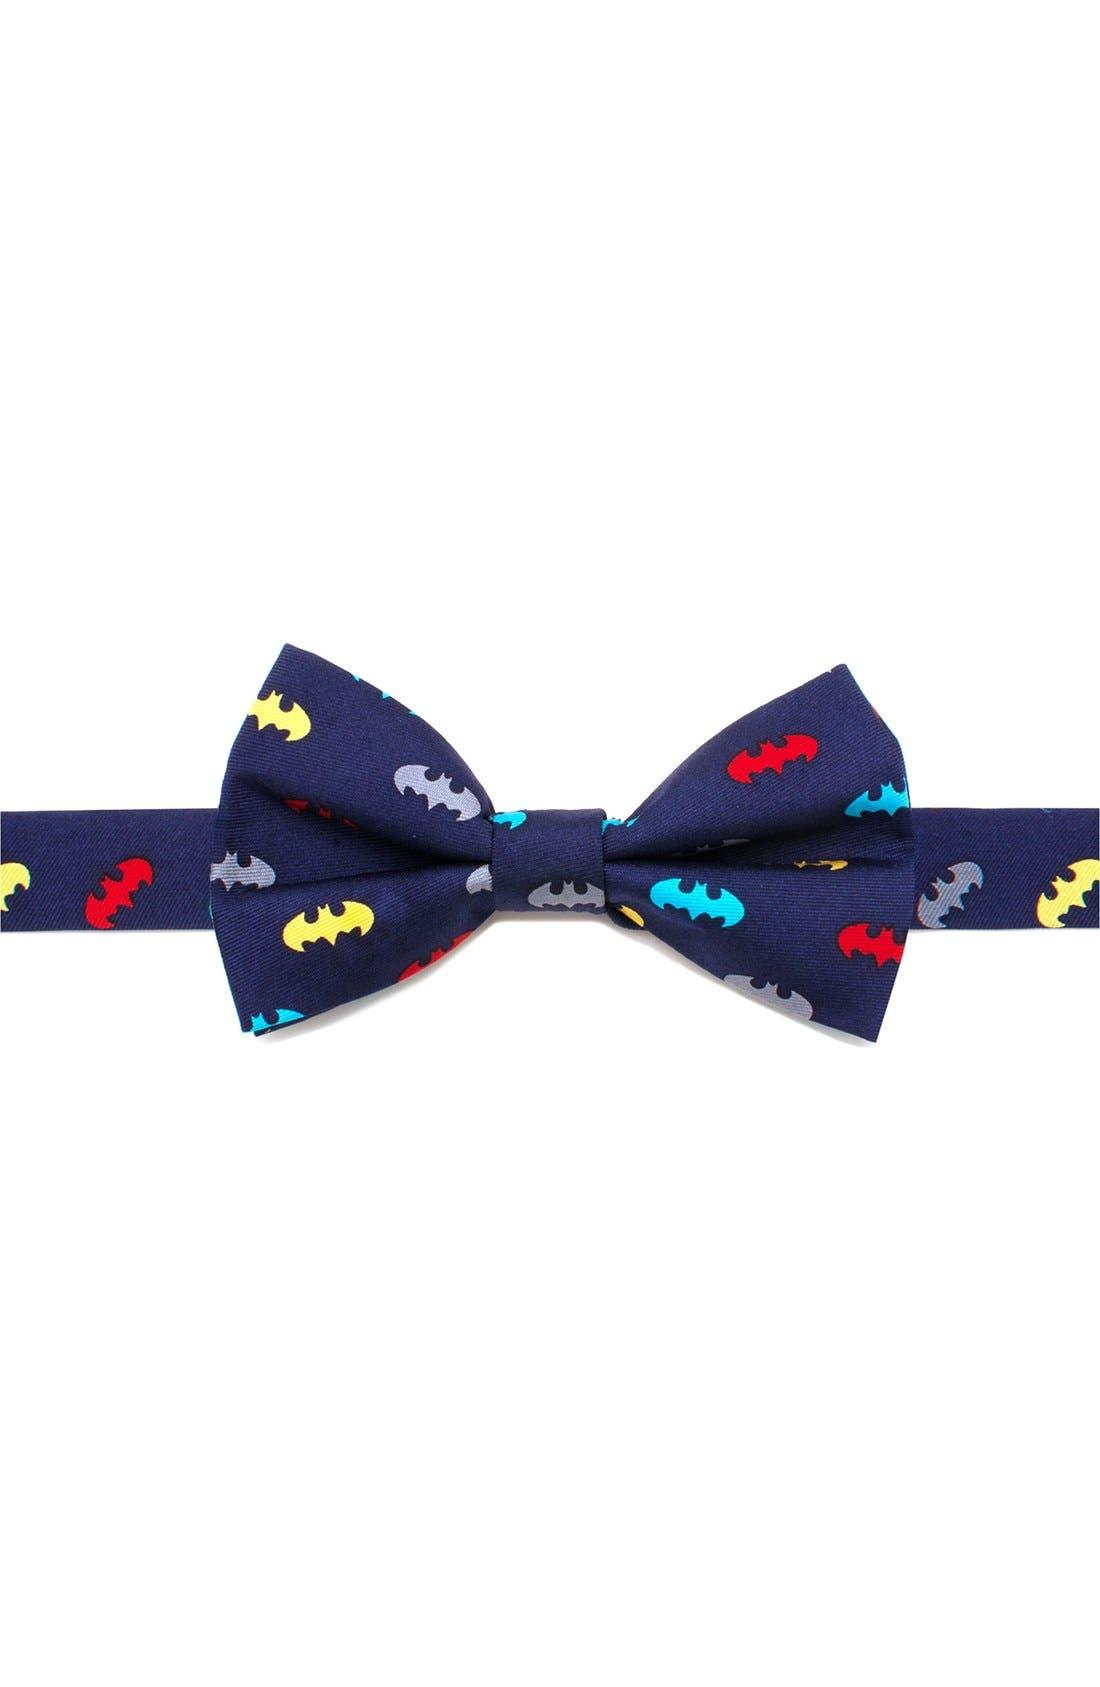 Alternate Image 1 Selected - Cufflinks, Inc. 'Batman' Silk Bow Tie (Little Boys & Big Boys)